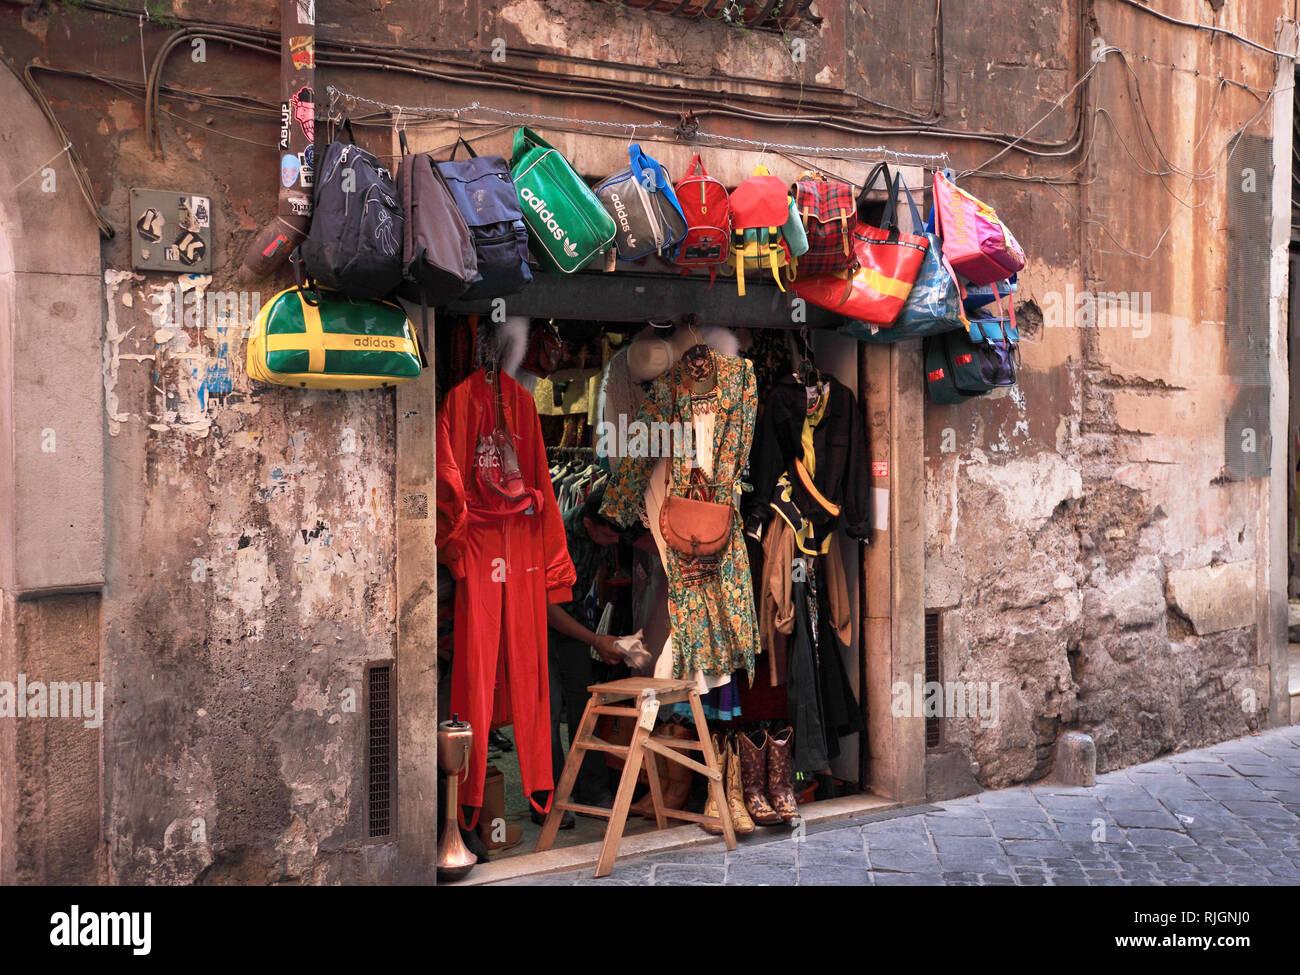 small second hand shop in a side street, Campo de fiori, Rome, Italy Stock Photo